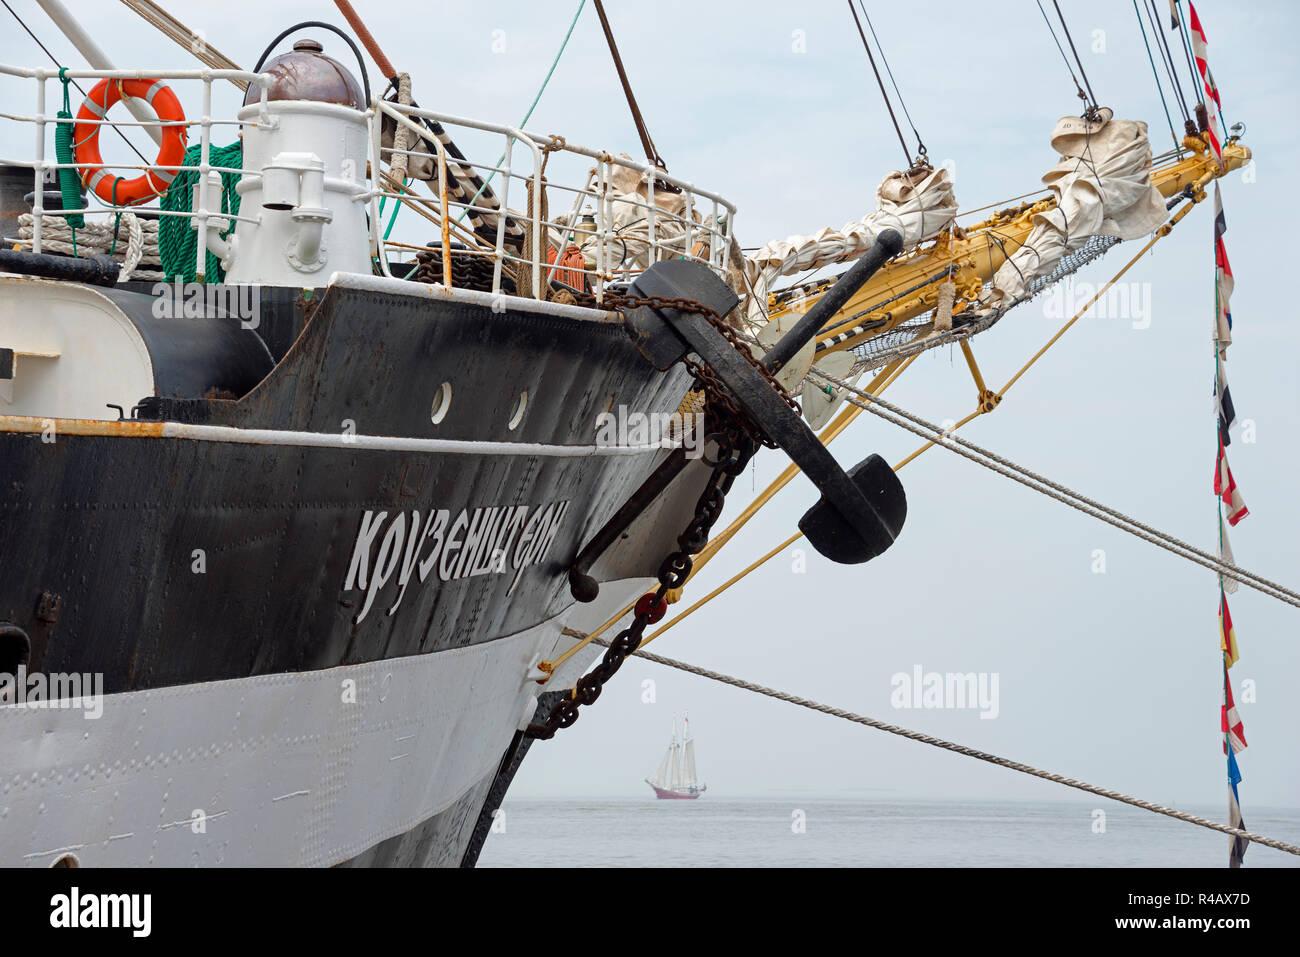 Kruzenshtern, Sailing ship, Bremerhaven, Lower Saxony, Germany - Stock Image